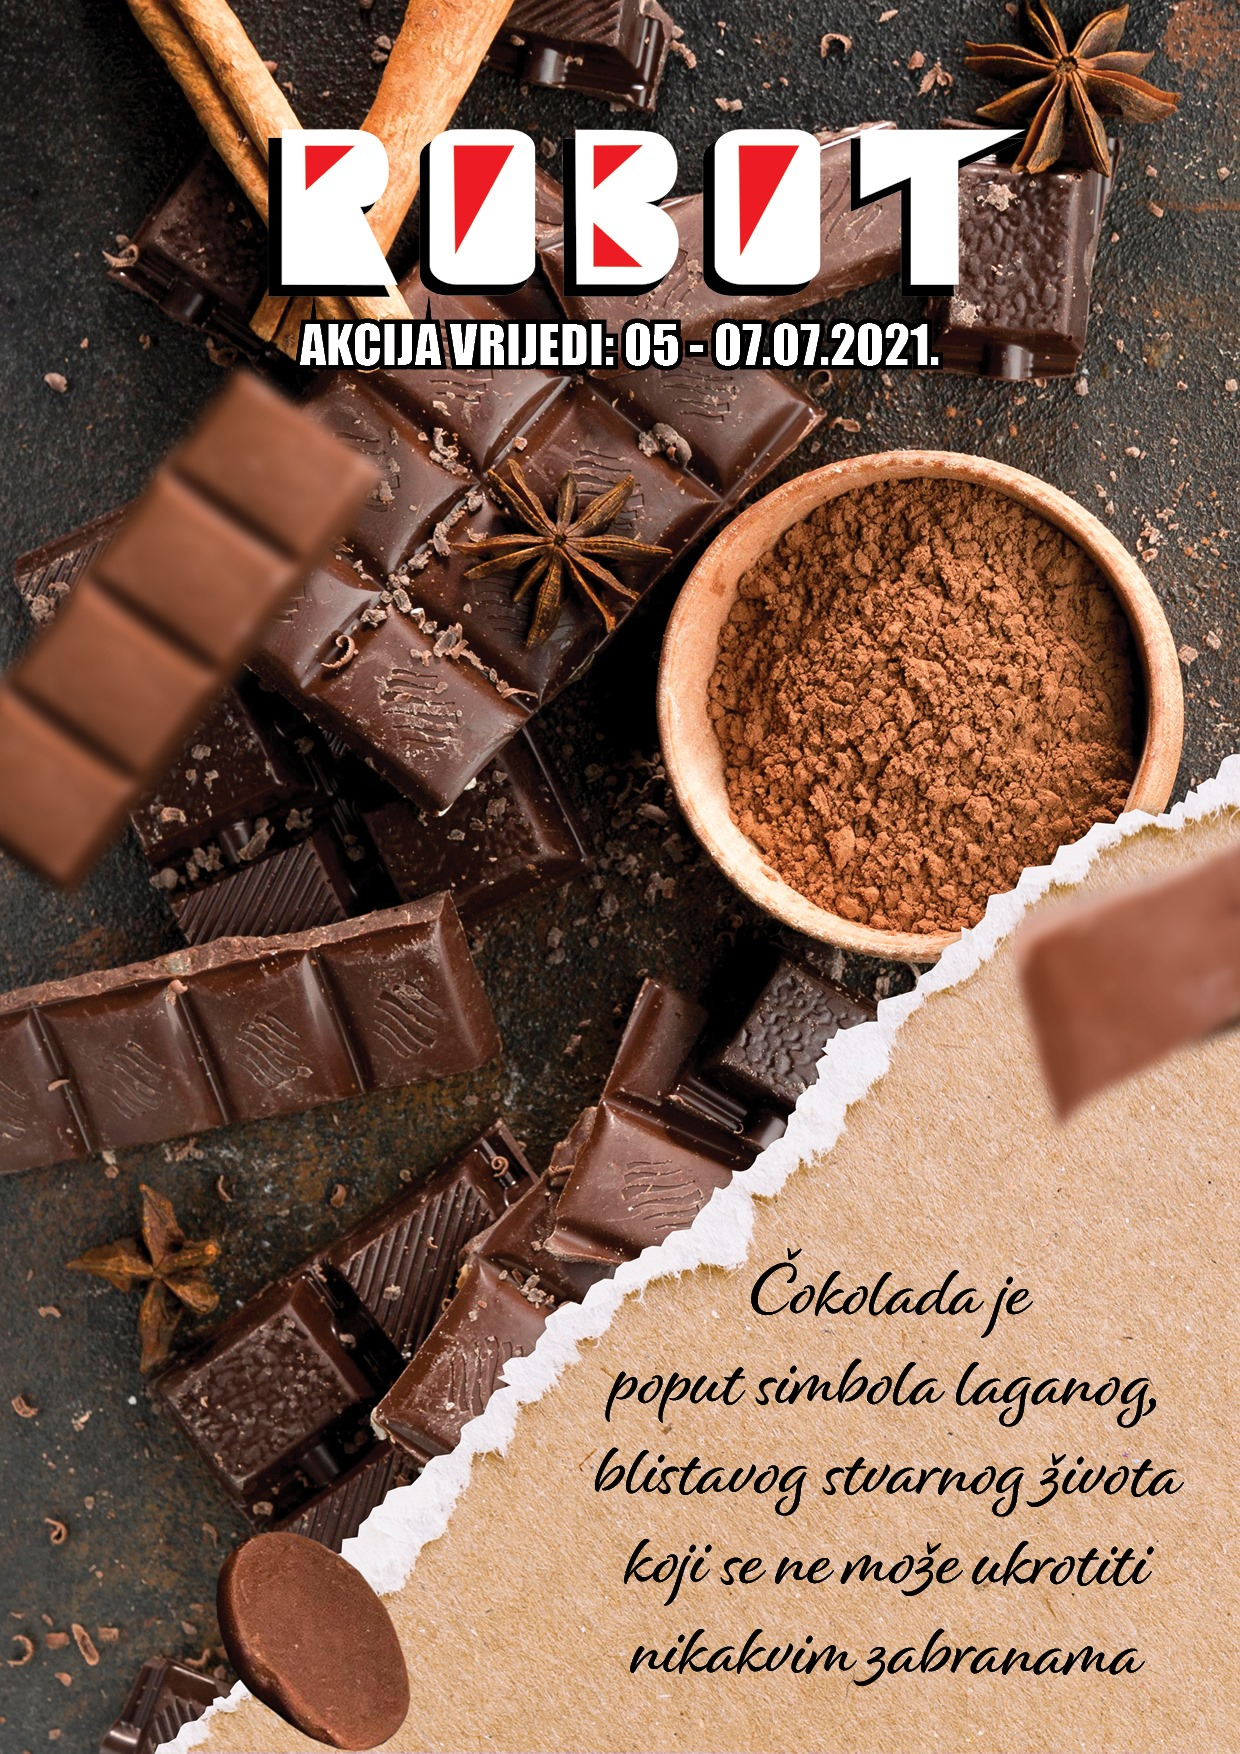 ROBOT Katalog Dani cokolade JUL 2021 5.7.2021. 7.7.2021 1